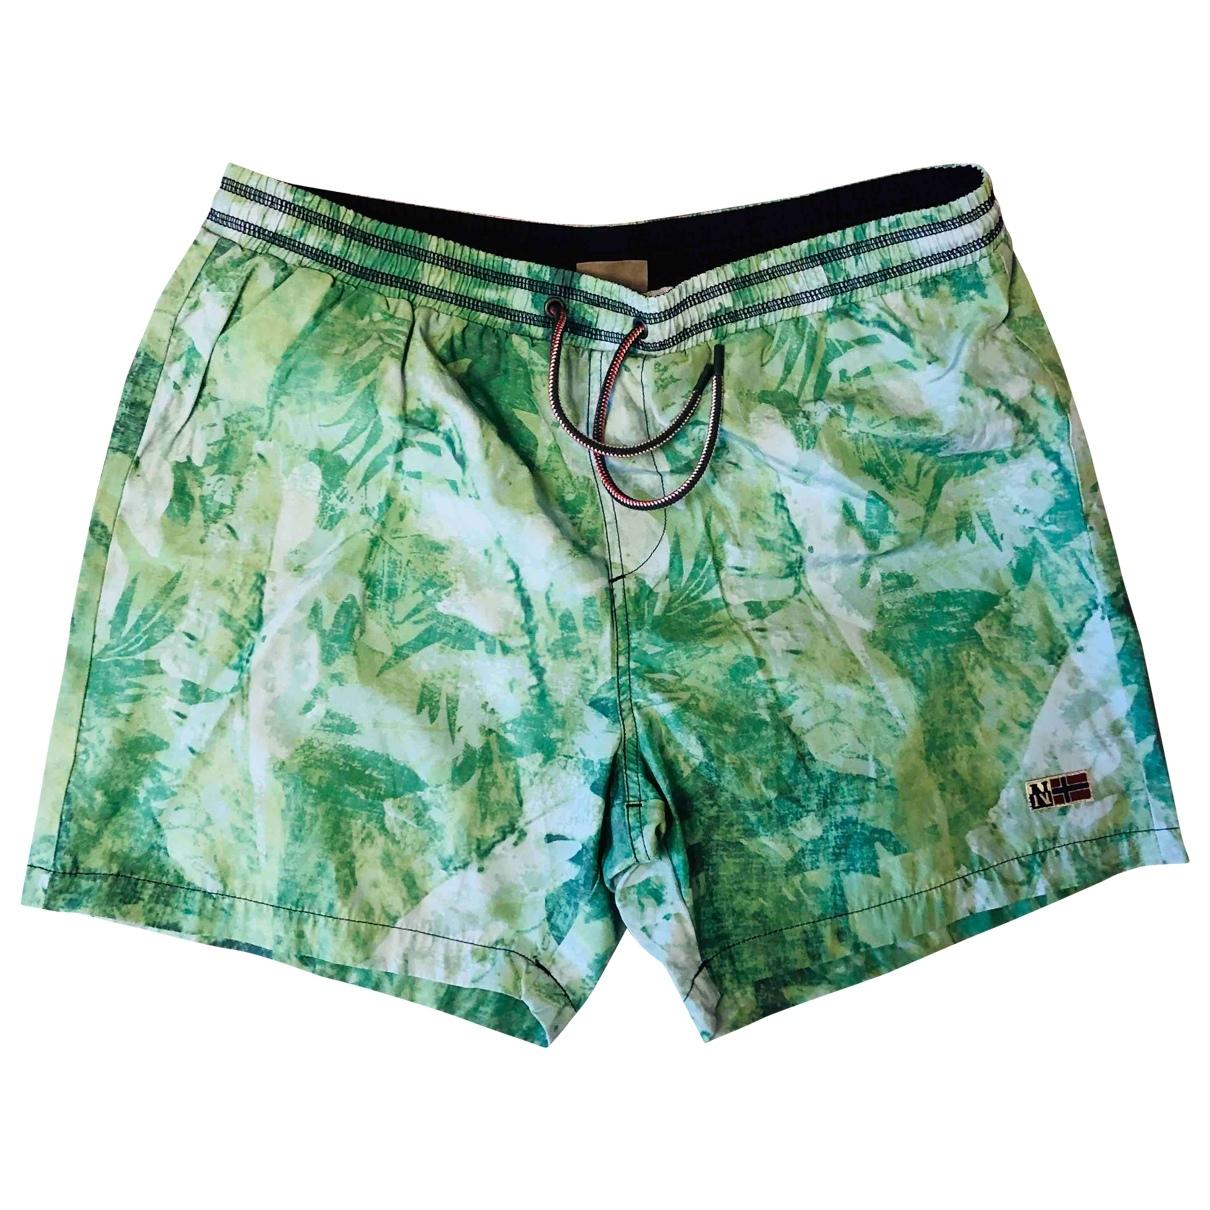 Napapijri \N Multicolour Swimwear for Men XL International